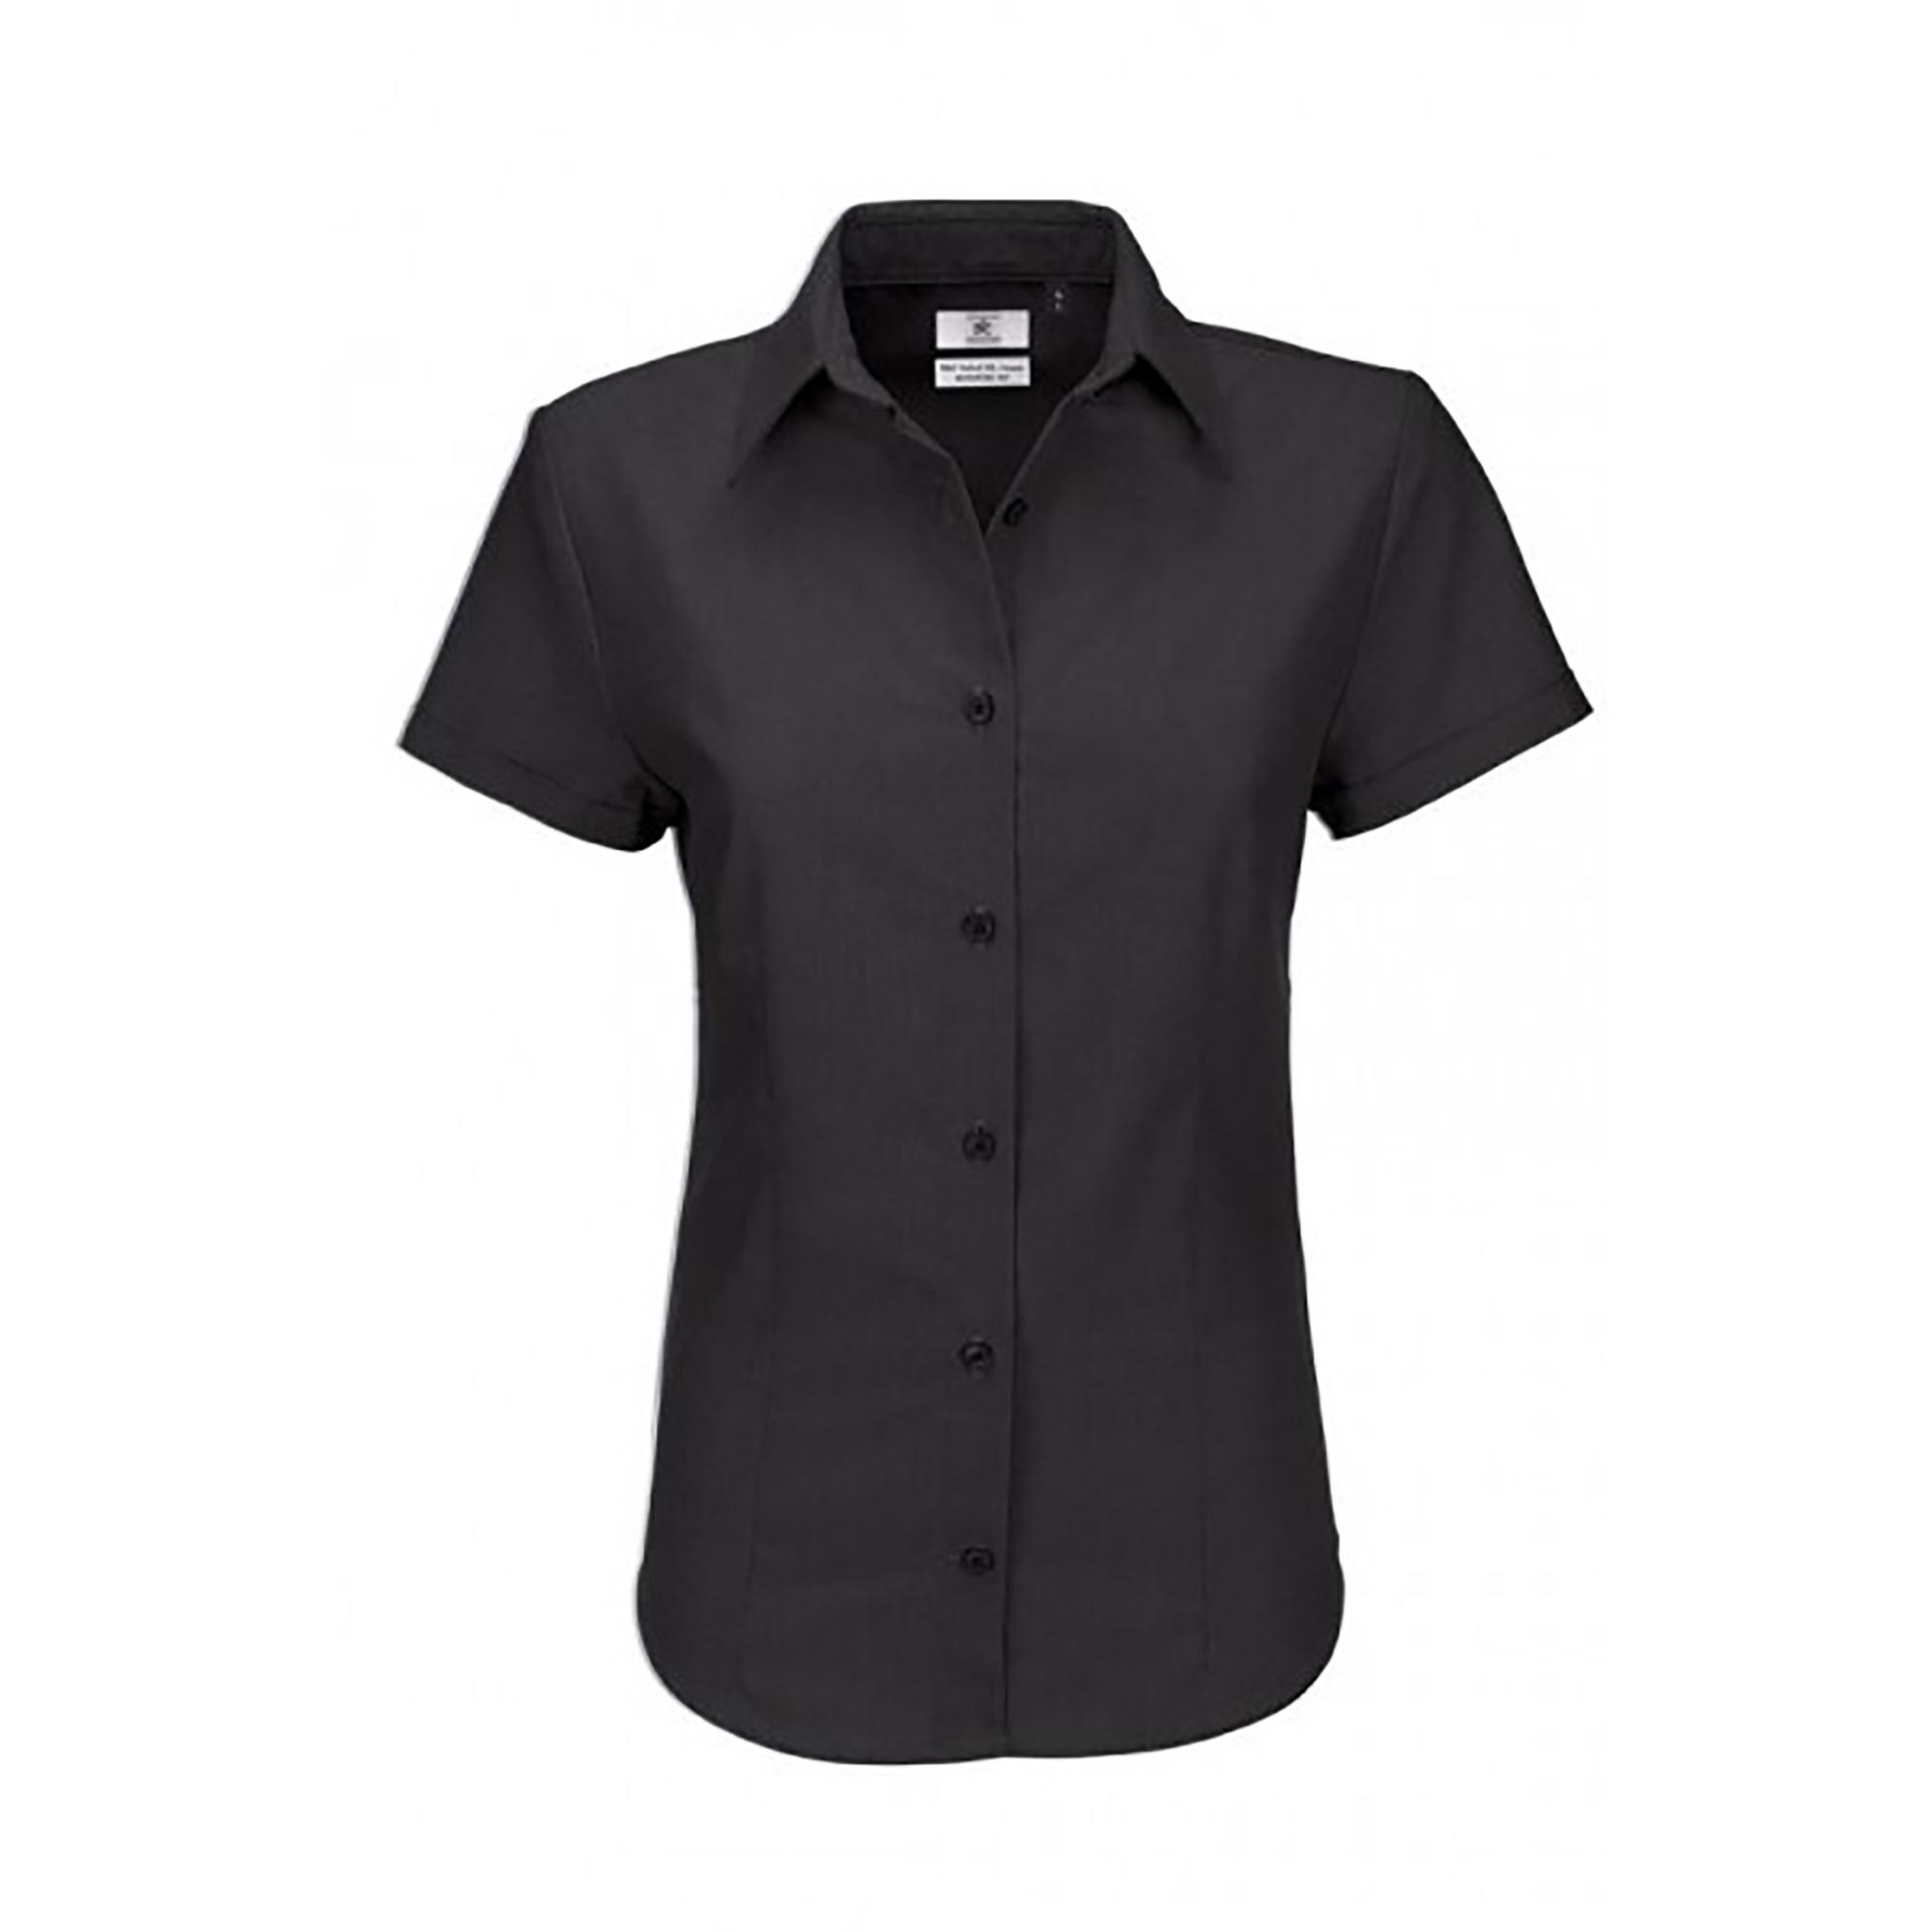 B&C Ladies Oxford Short Sleeve Shirt / Ladies Shirts (3XL) (Silver Moon)